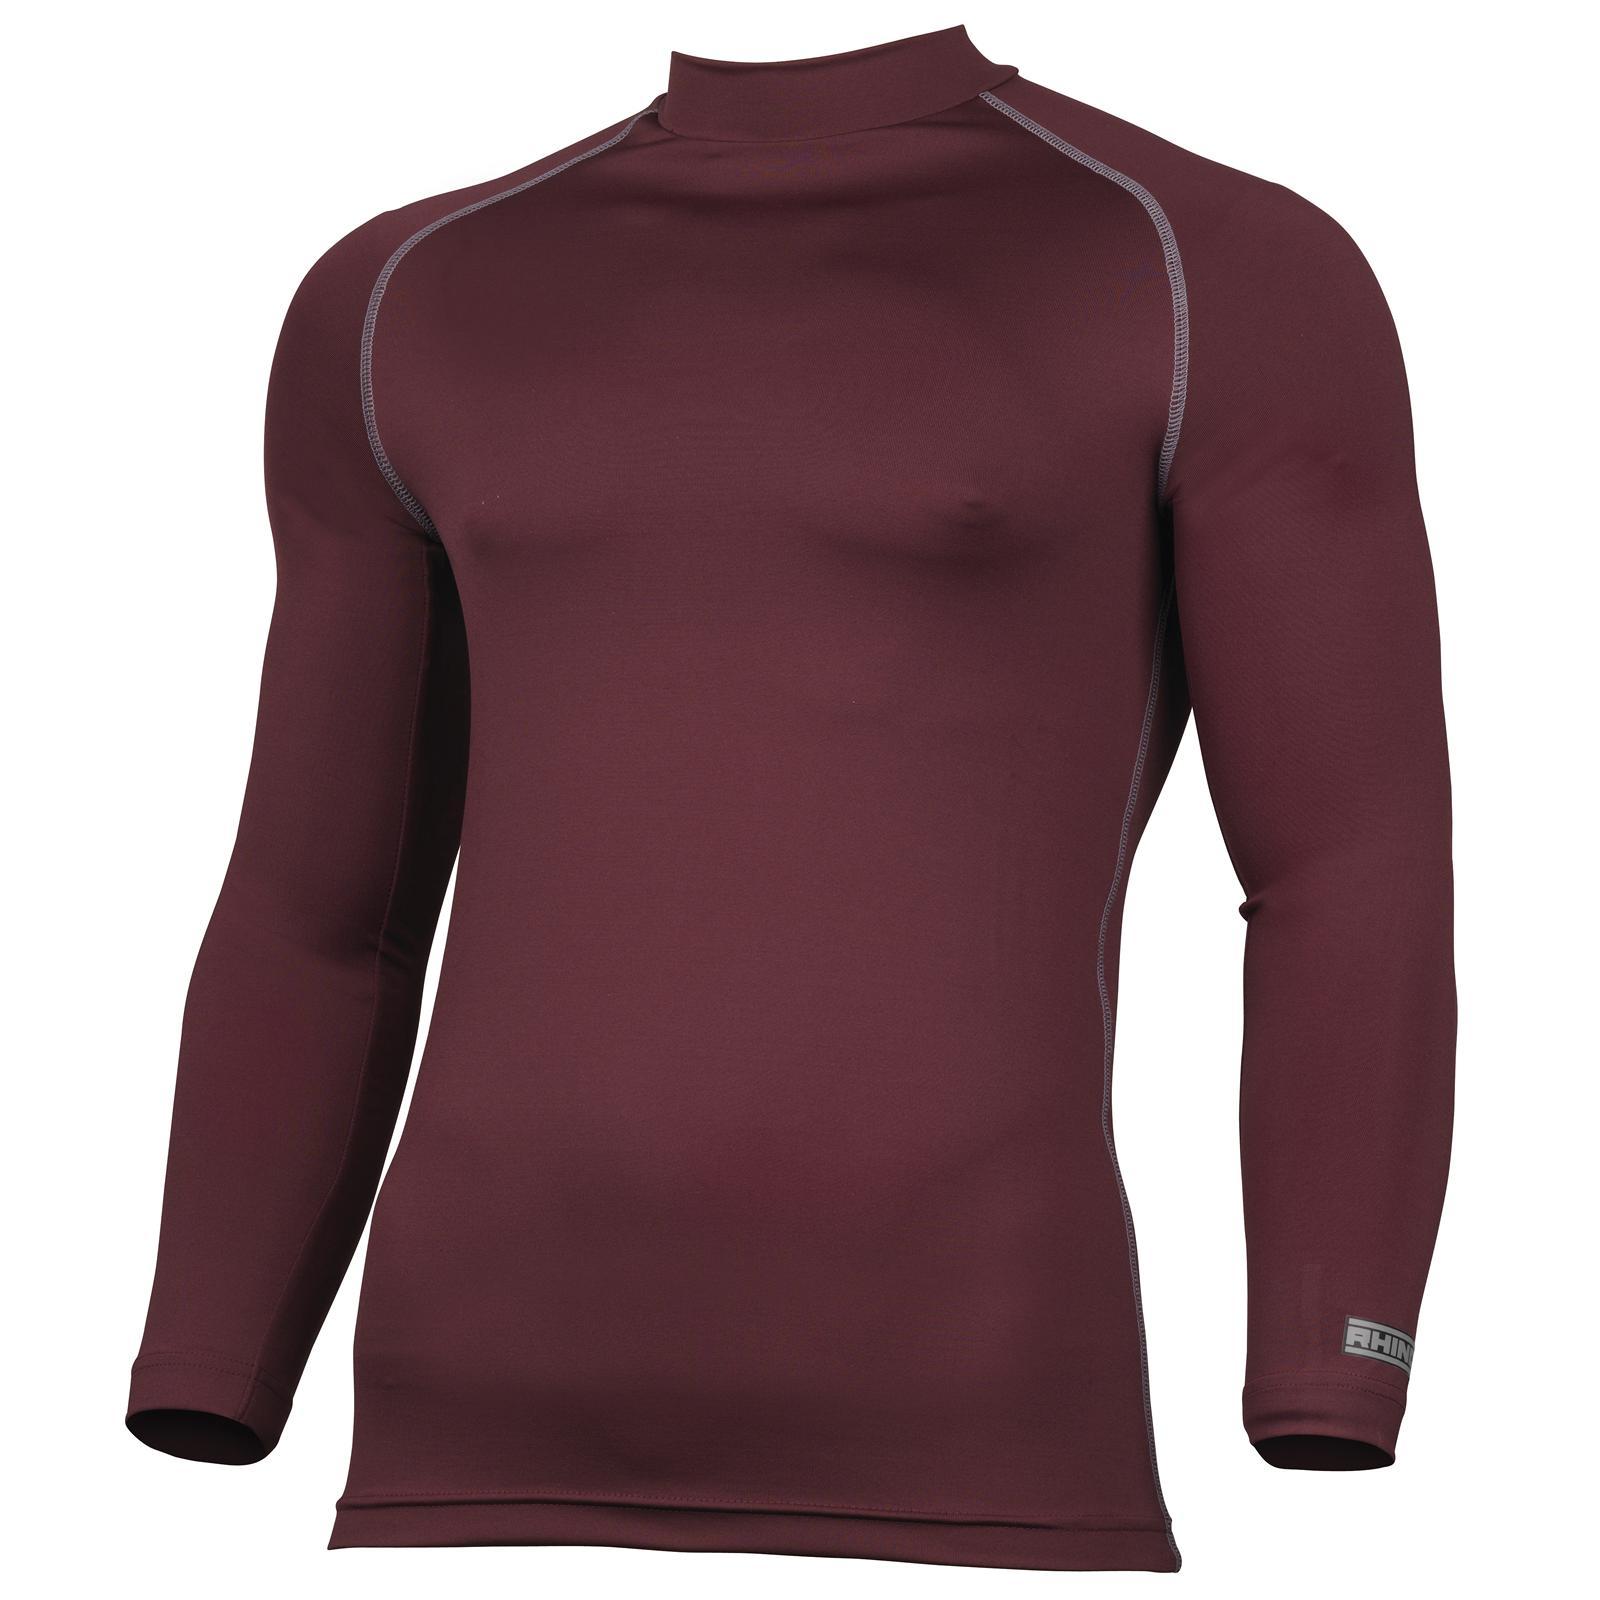 New-RHINO-Unisex-Adults-Sports-Long-Sleeve-Base-Layer-T-Shirt-16-Colours-5-Sizes